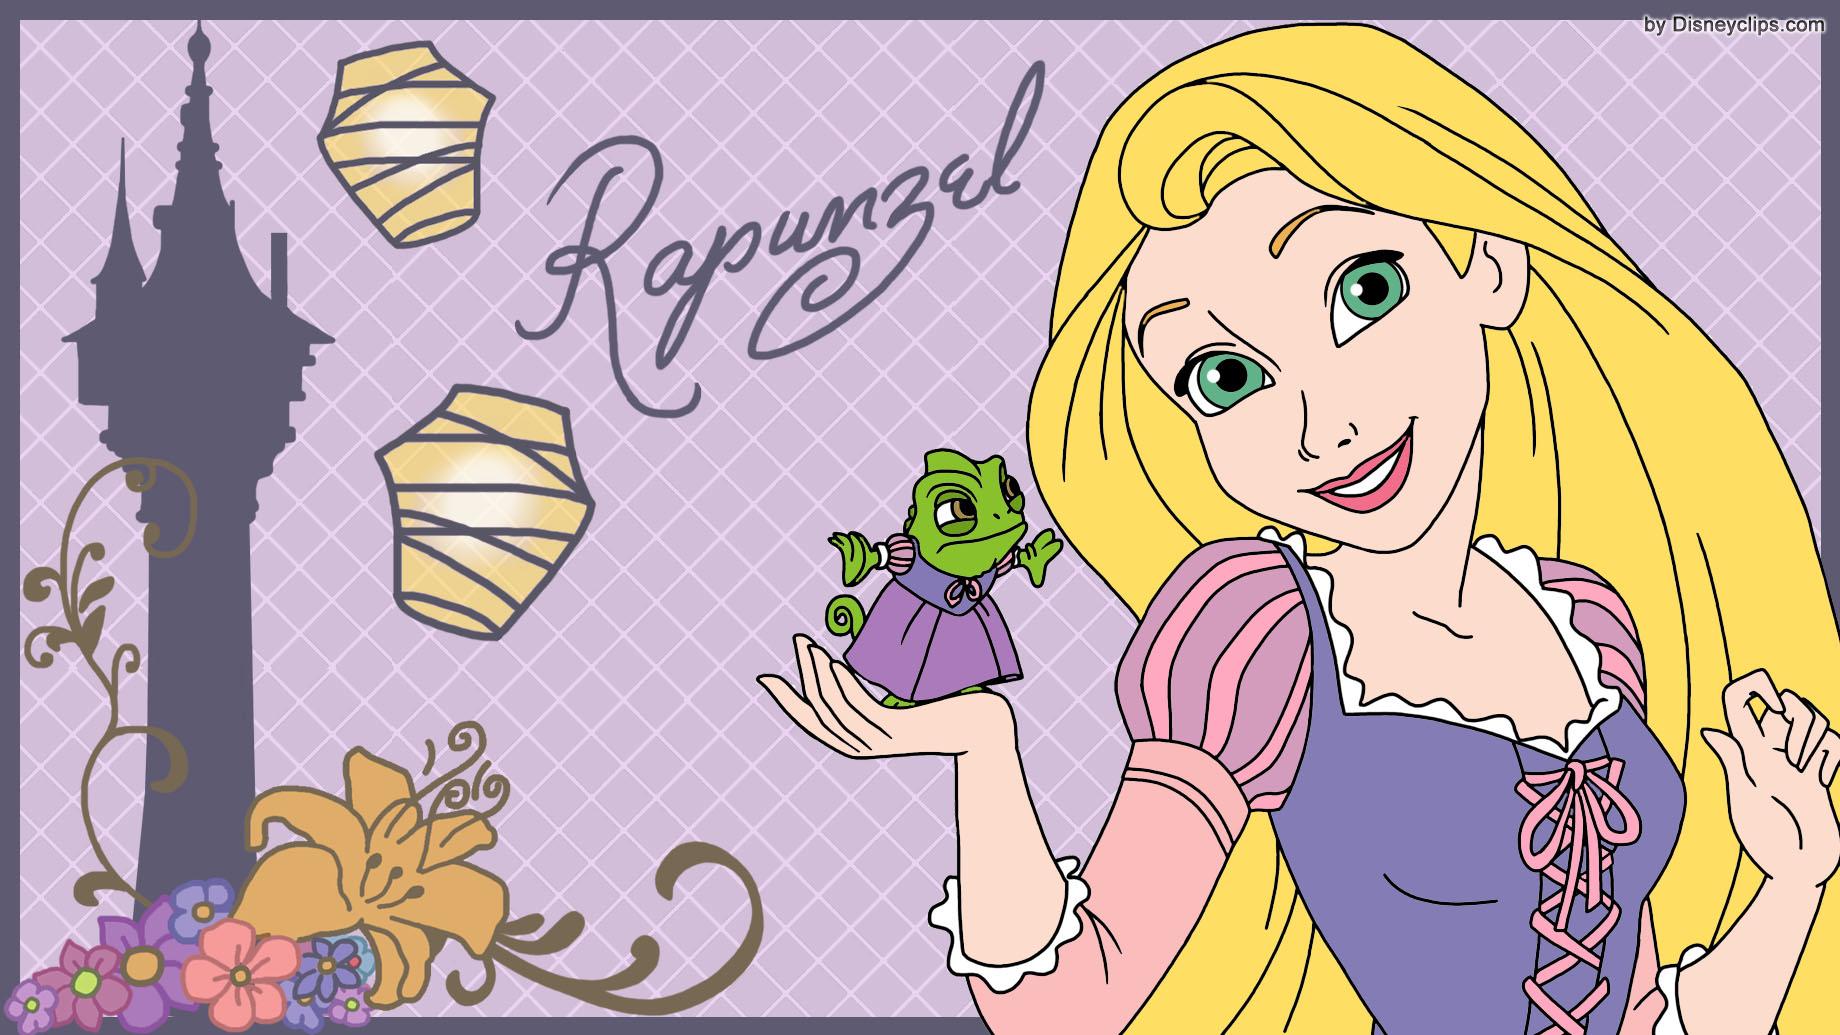 Rapunzel Wallpaper For Your Desktop